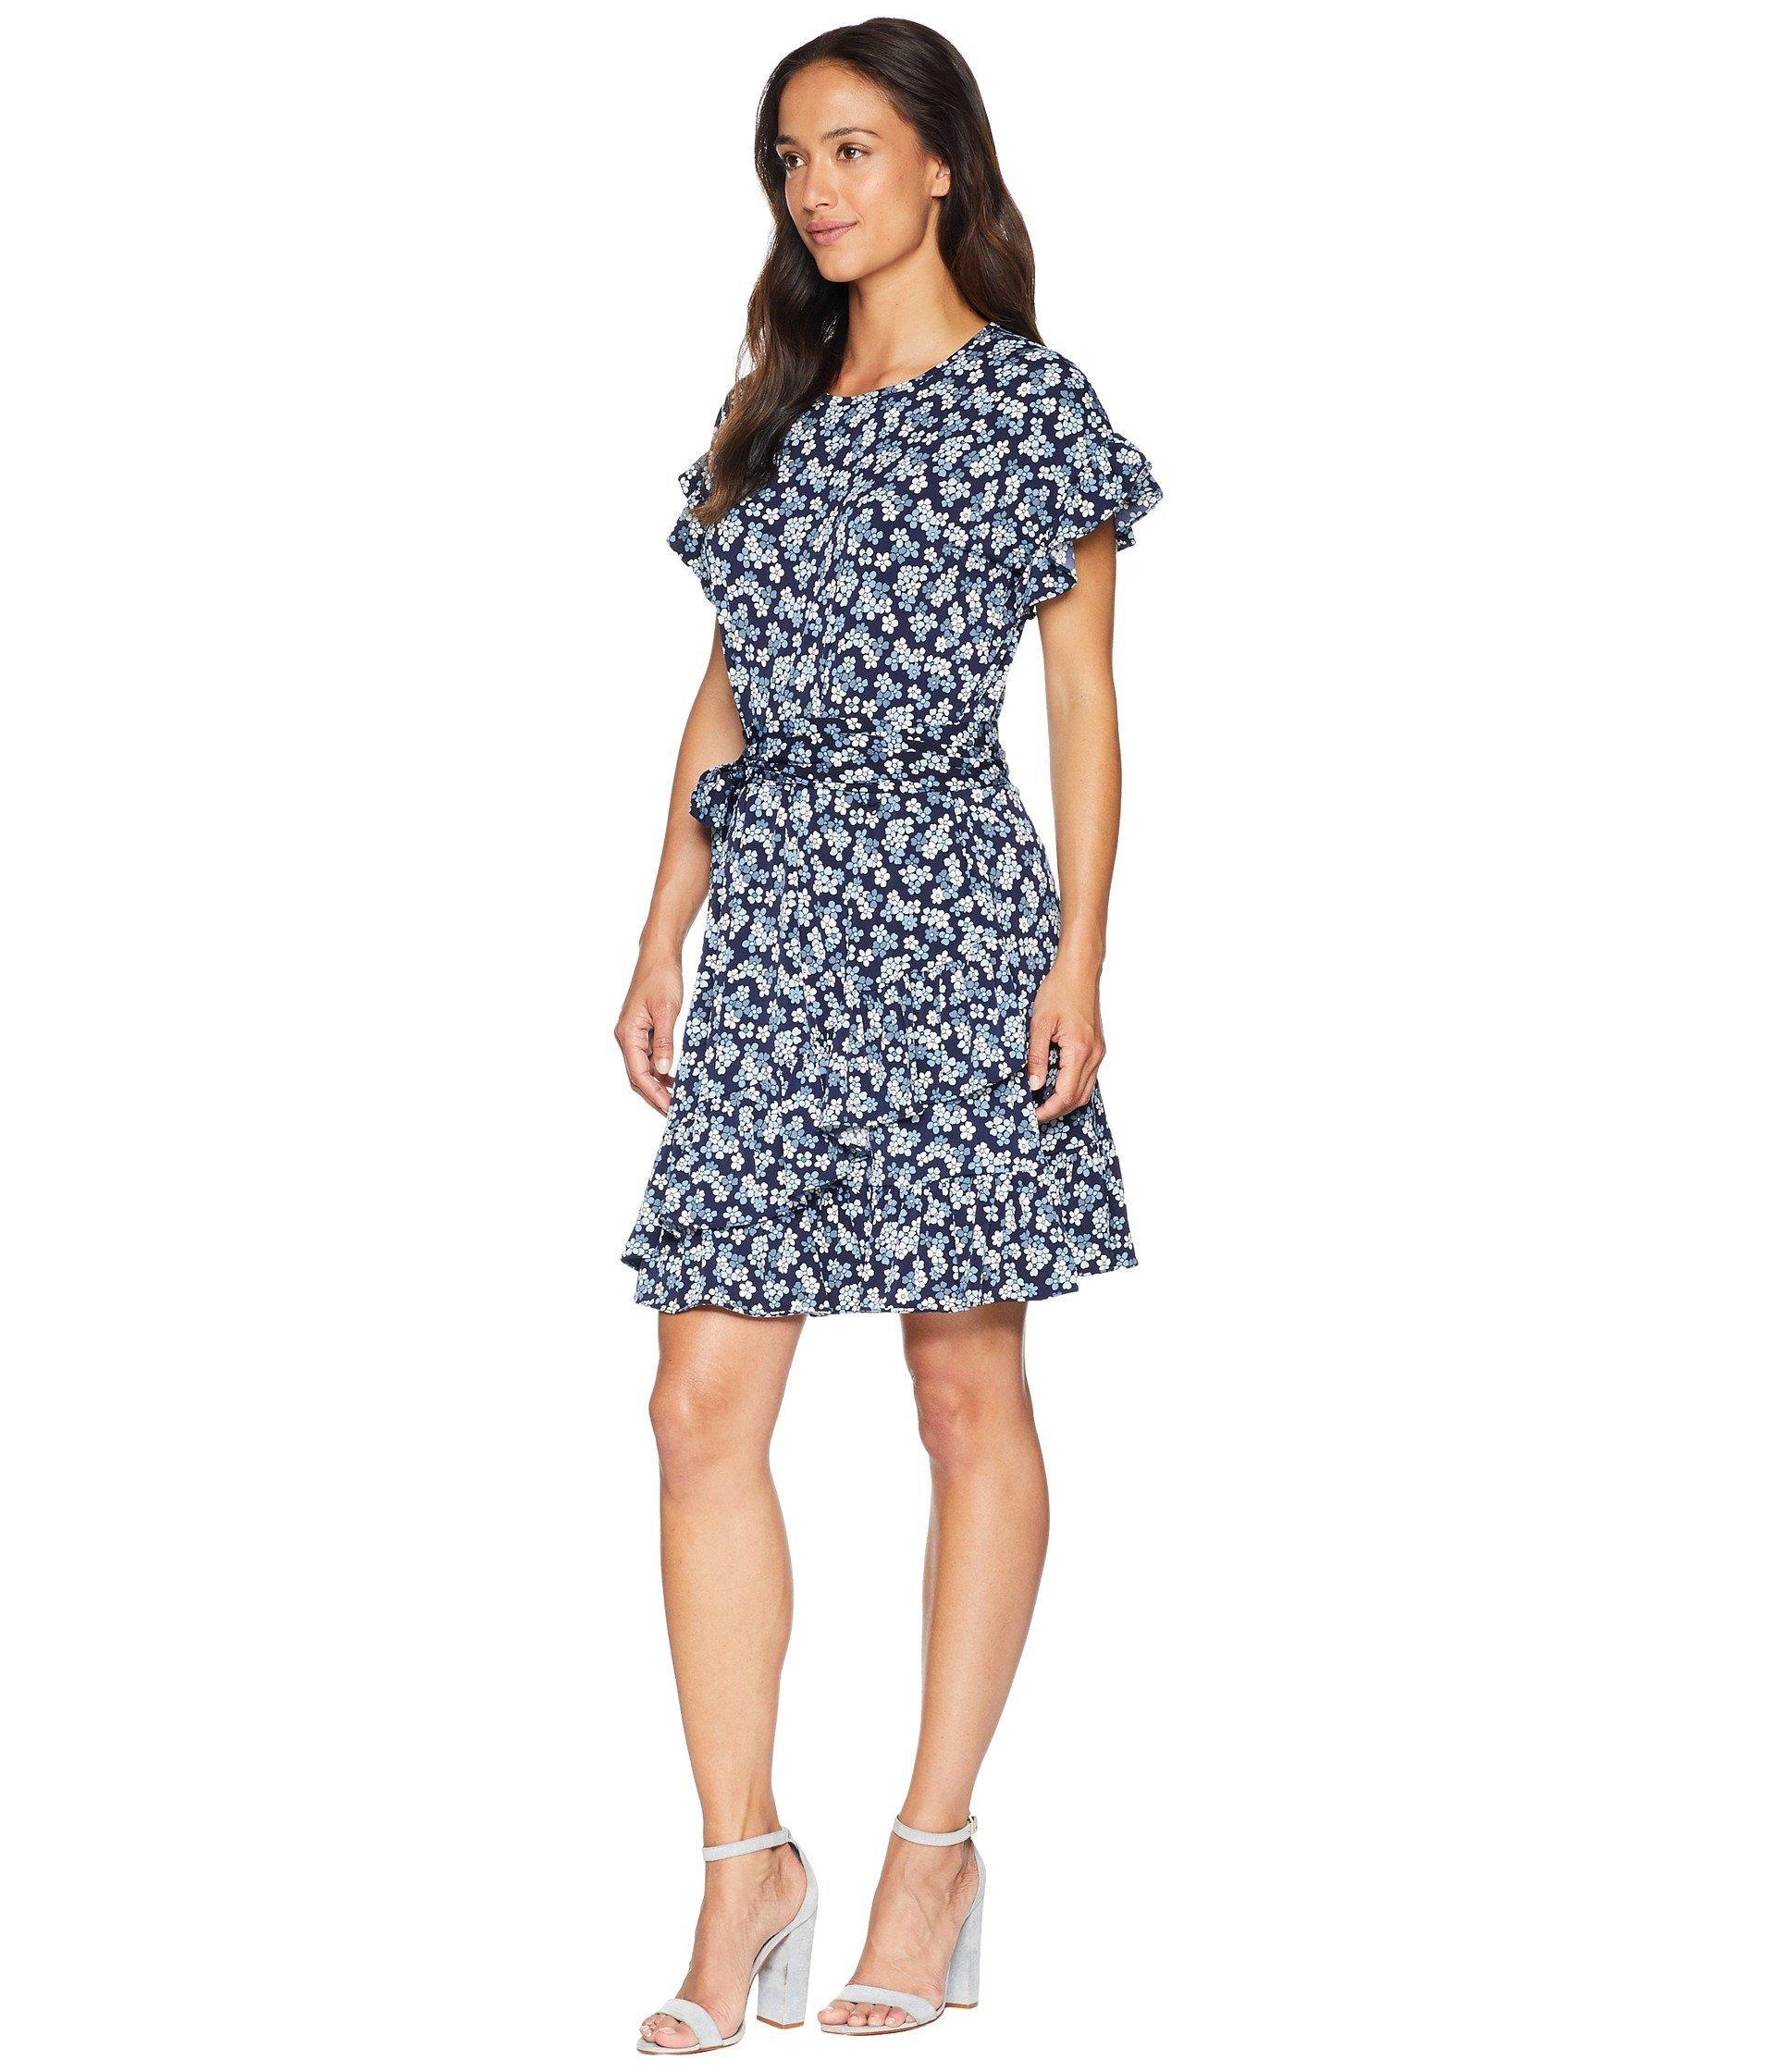 1371b9da239c6 Lyst - MICHAEL Michael Kors Cherry Ruffle Wrap Dress in Blue - Save 40%